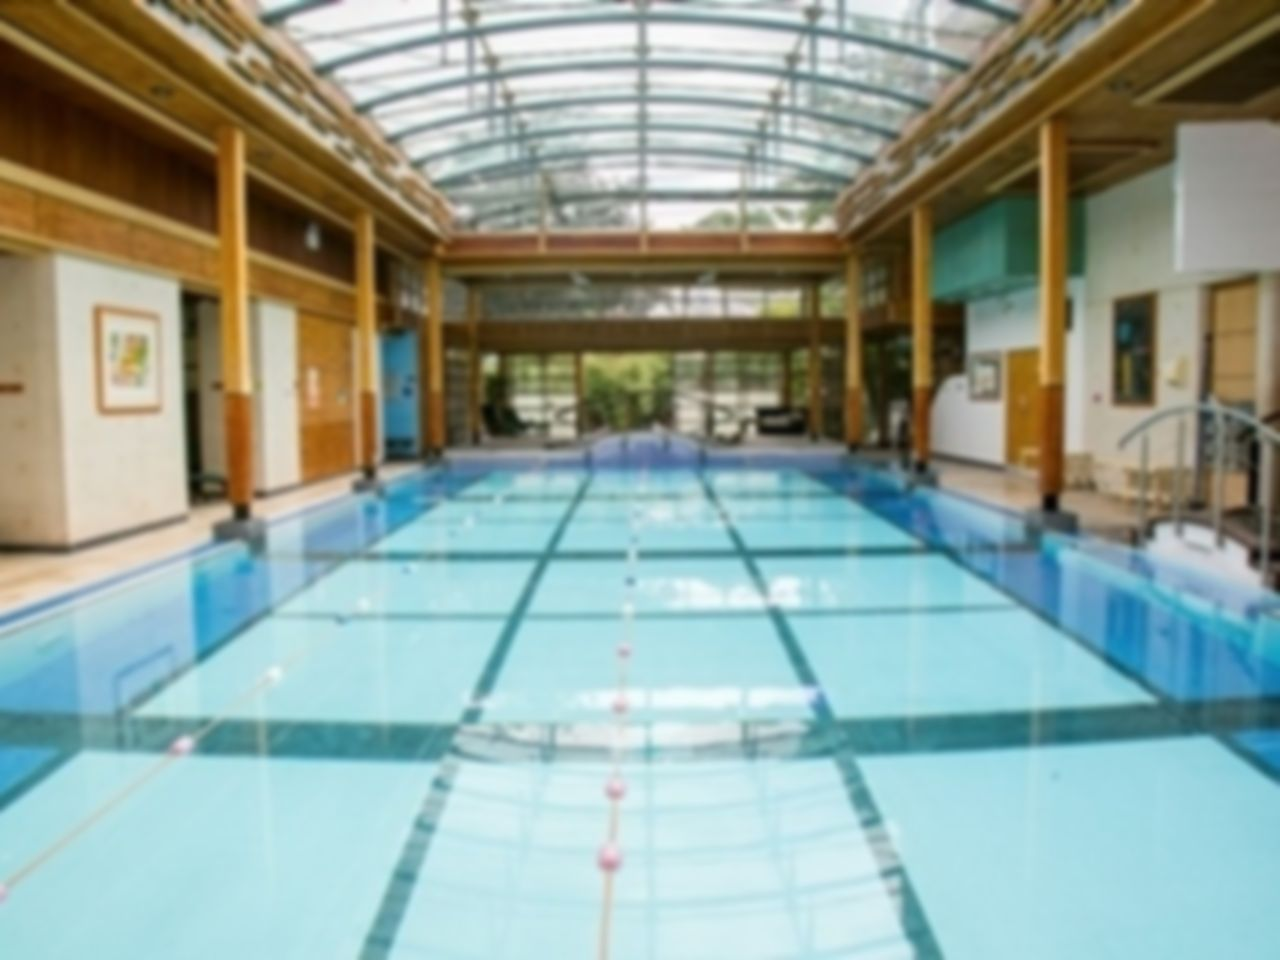 Cedars Leisure Club Flexible Gym Passes Tw10 London